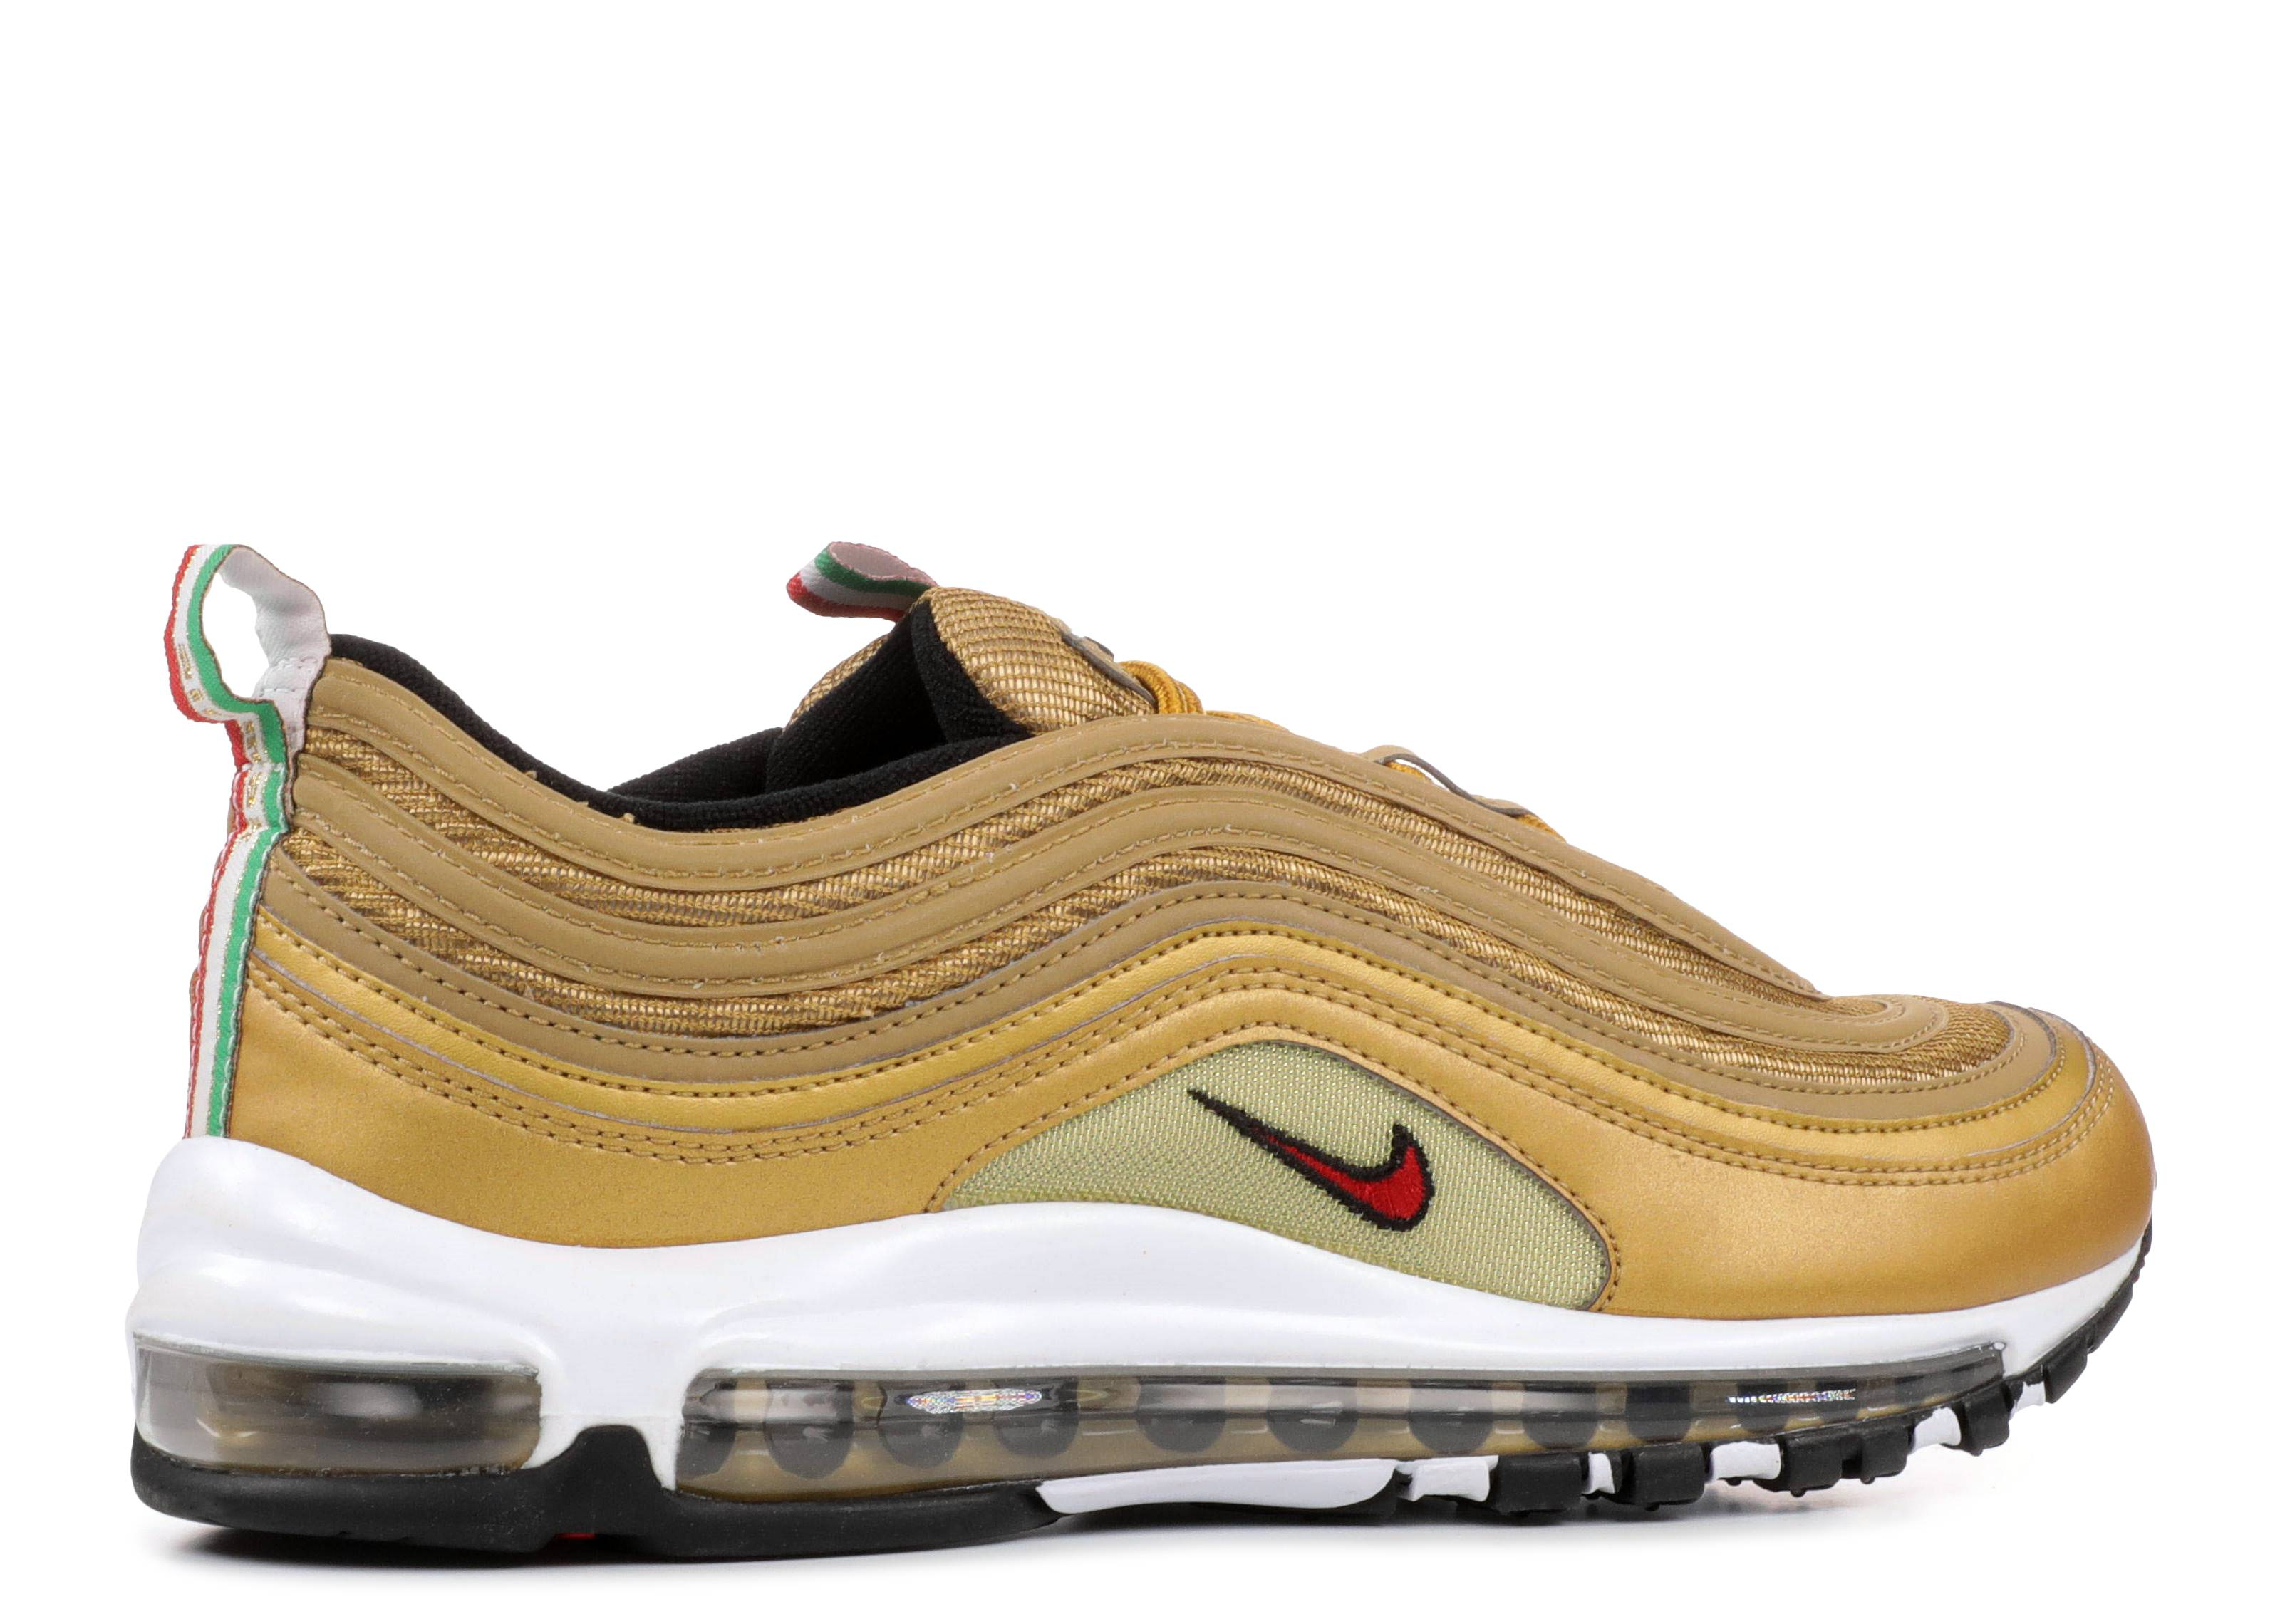 Nike Air Max 97 Metallic Gold It Italy Aj8056 700